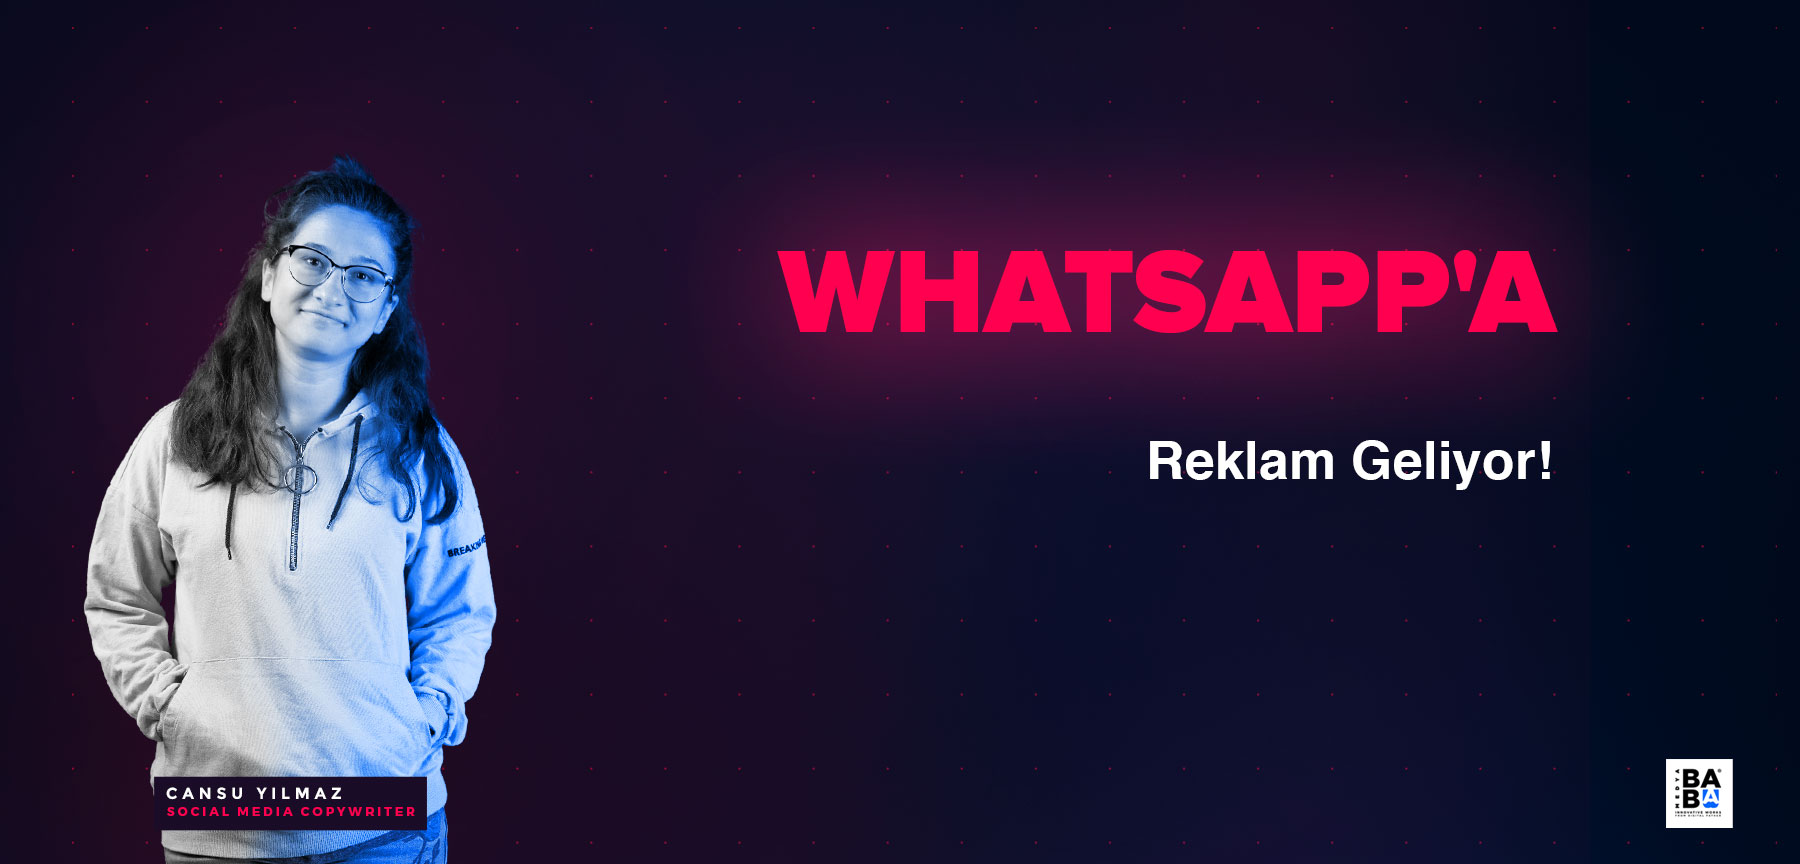 Whatsapp'a Reklam Geliyor!